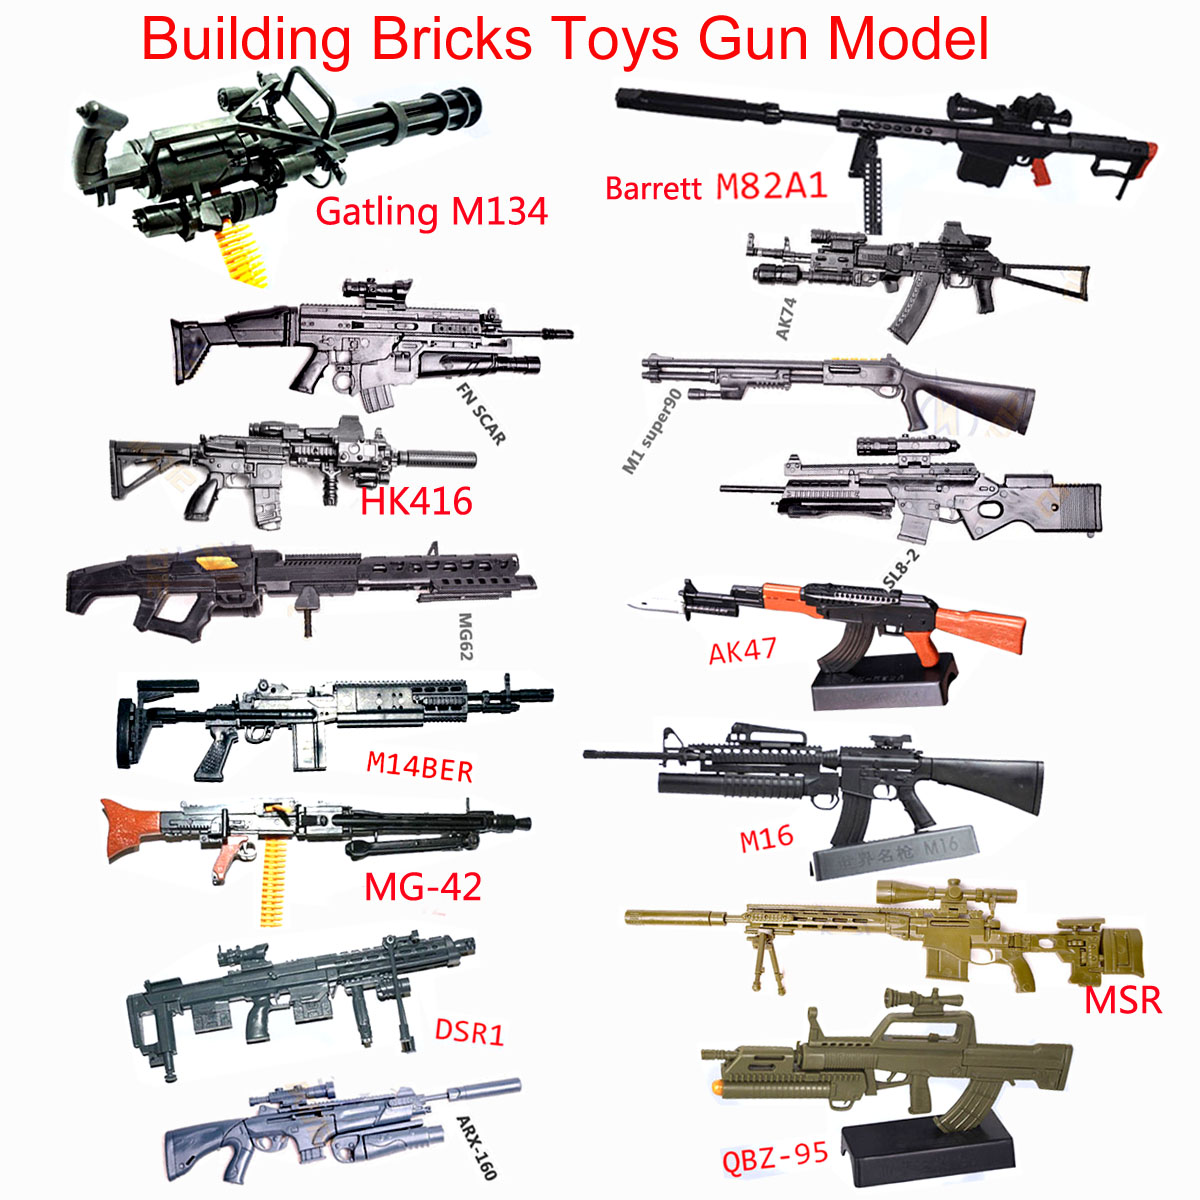 1:6 Scale Toy Gun Model M134 MG42 AK47 98K Rifle Puzzles Building Bricks Assembled Gun Model PUBG Weapon For Action Figure